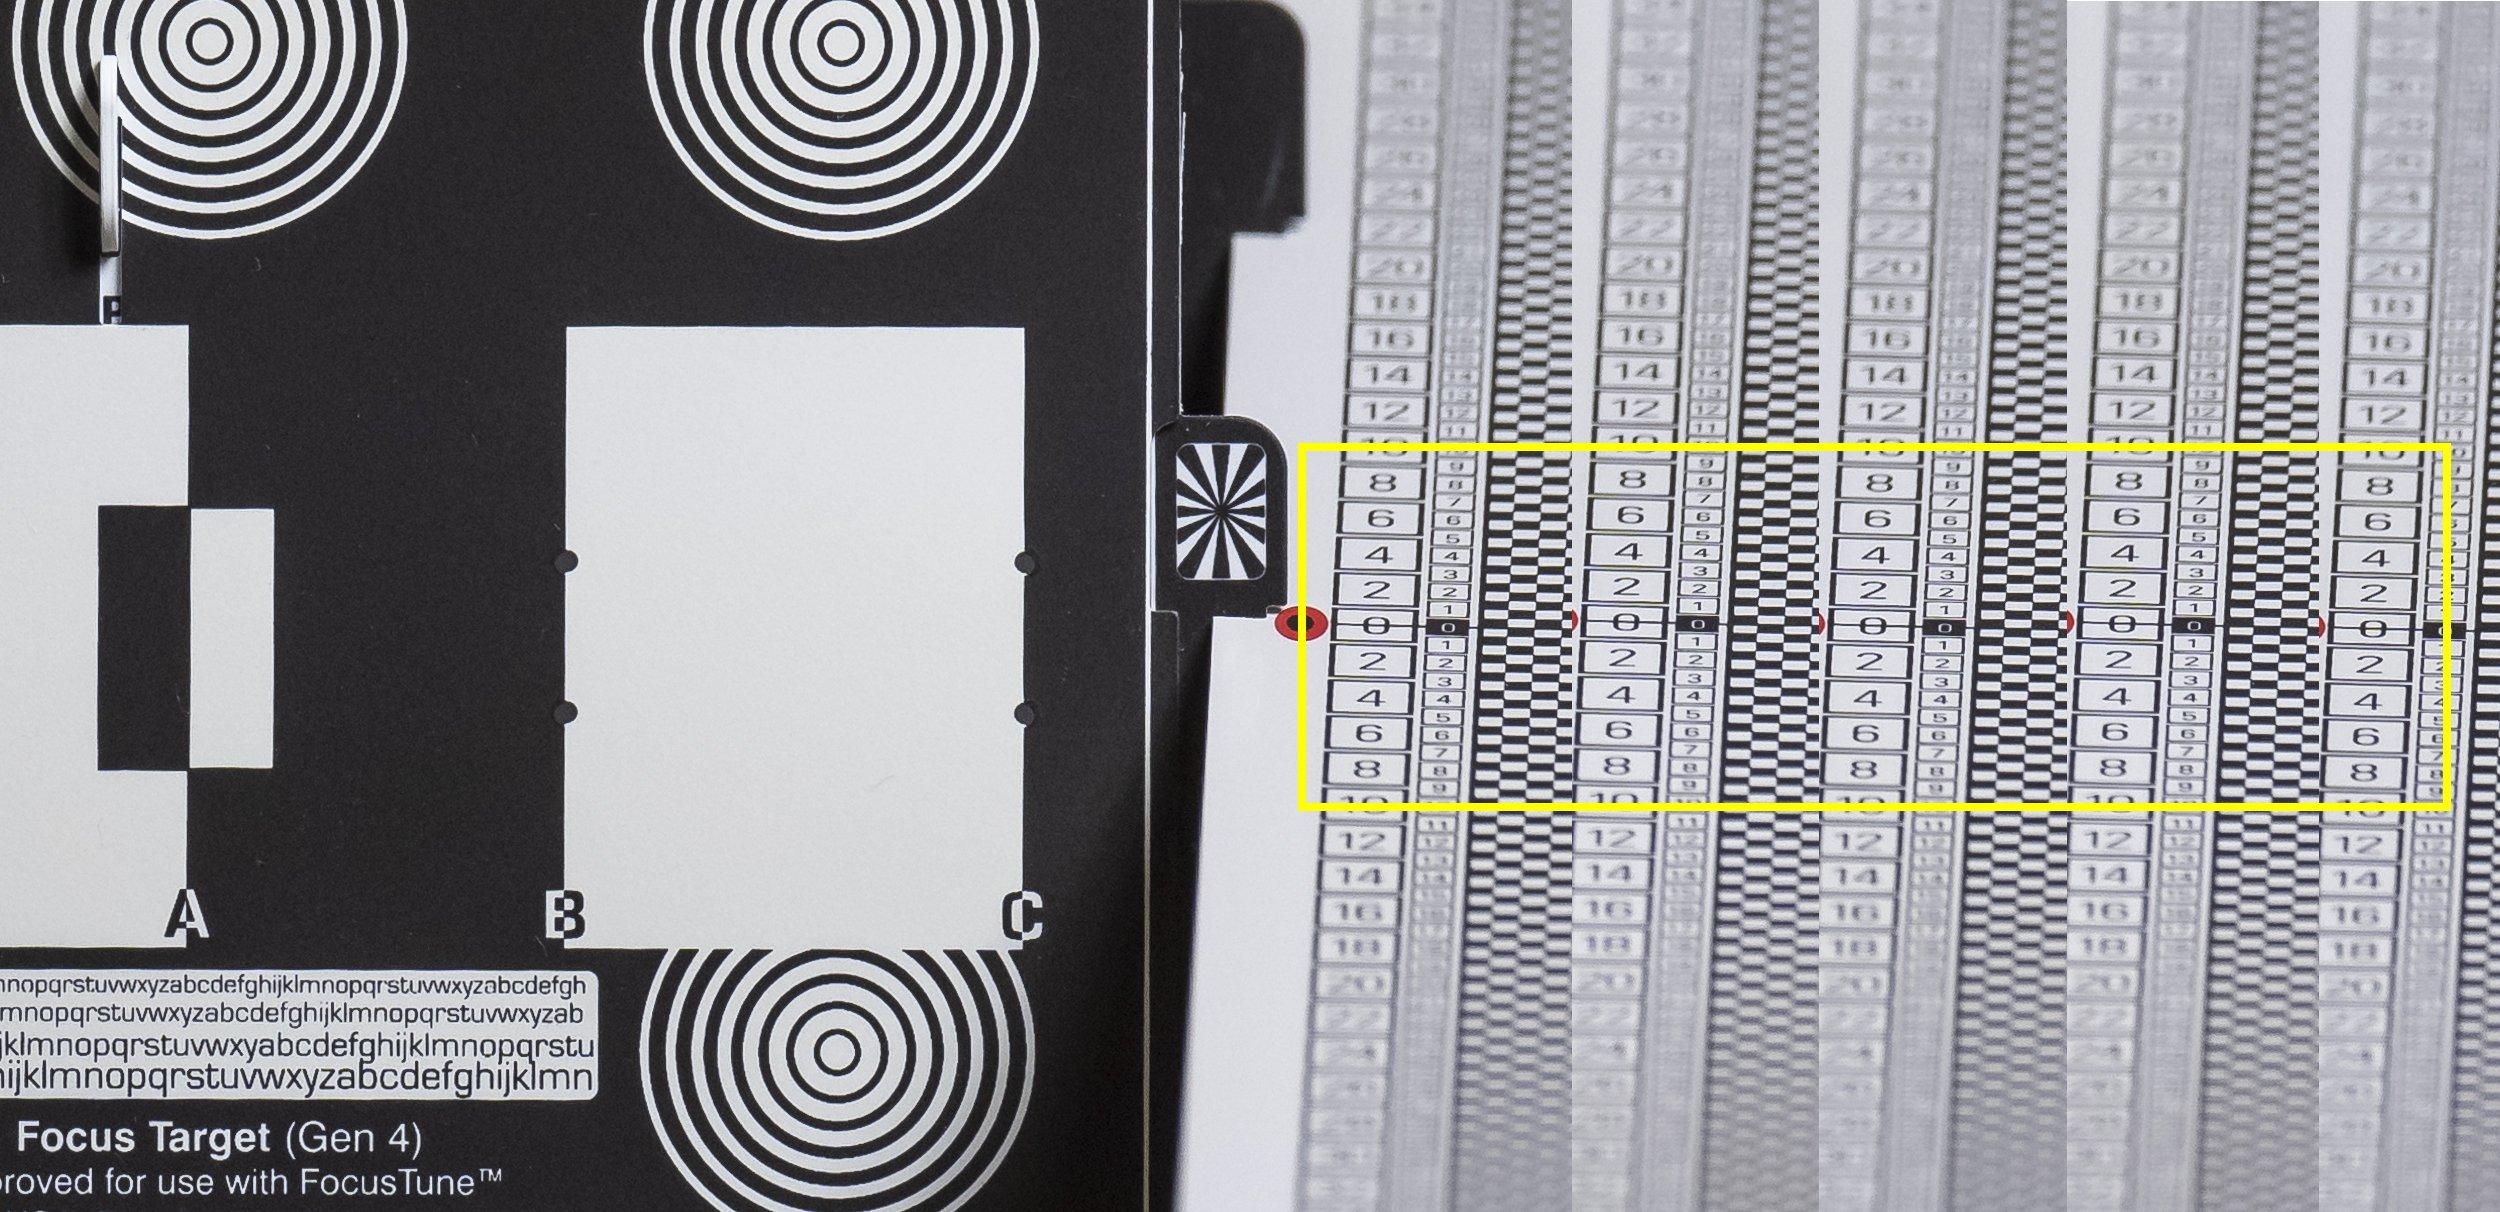 Z7 mit AF-S NIKKOR 500mm 1:5,6E PF ED VR - 5 RAW Bilder nebeneinander - kein Front- oder Back-Fokus!